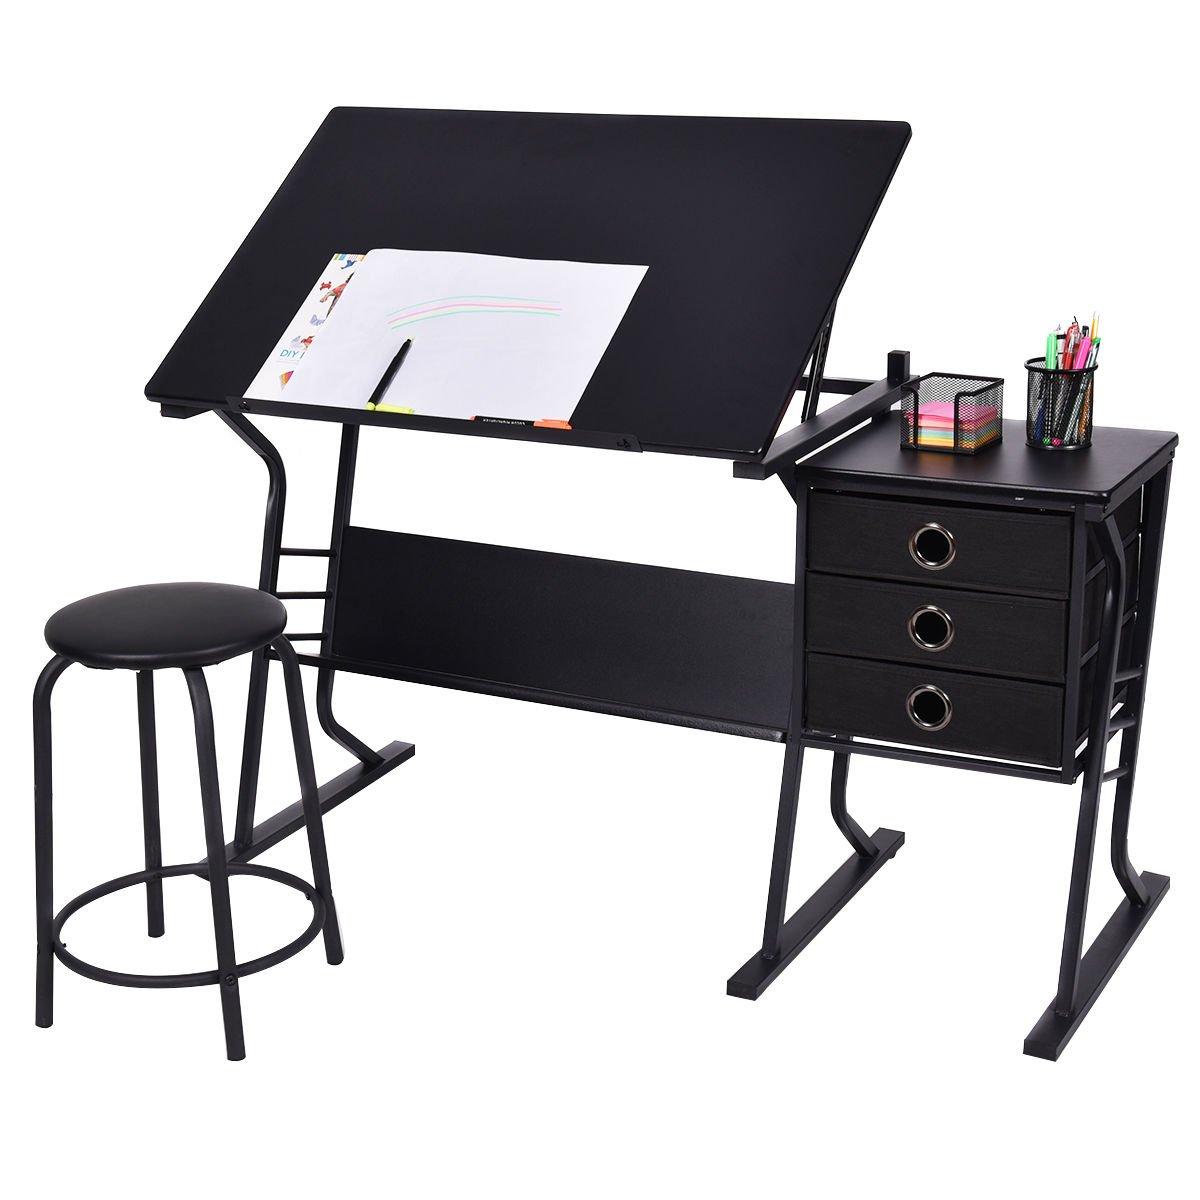 Picotech Drafting Desk MDF PVC Heavy Gauge Steel Stool Powder Coated Black Stylish Sturdy Durable 3 Pull-Out Drawer 1 Organize Storage Shelf Adjustable Tilt Desktop Writing Drawing Design Office Home by Picotech